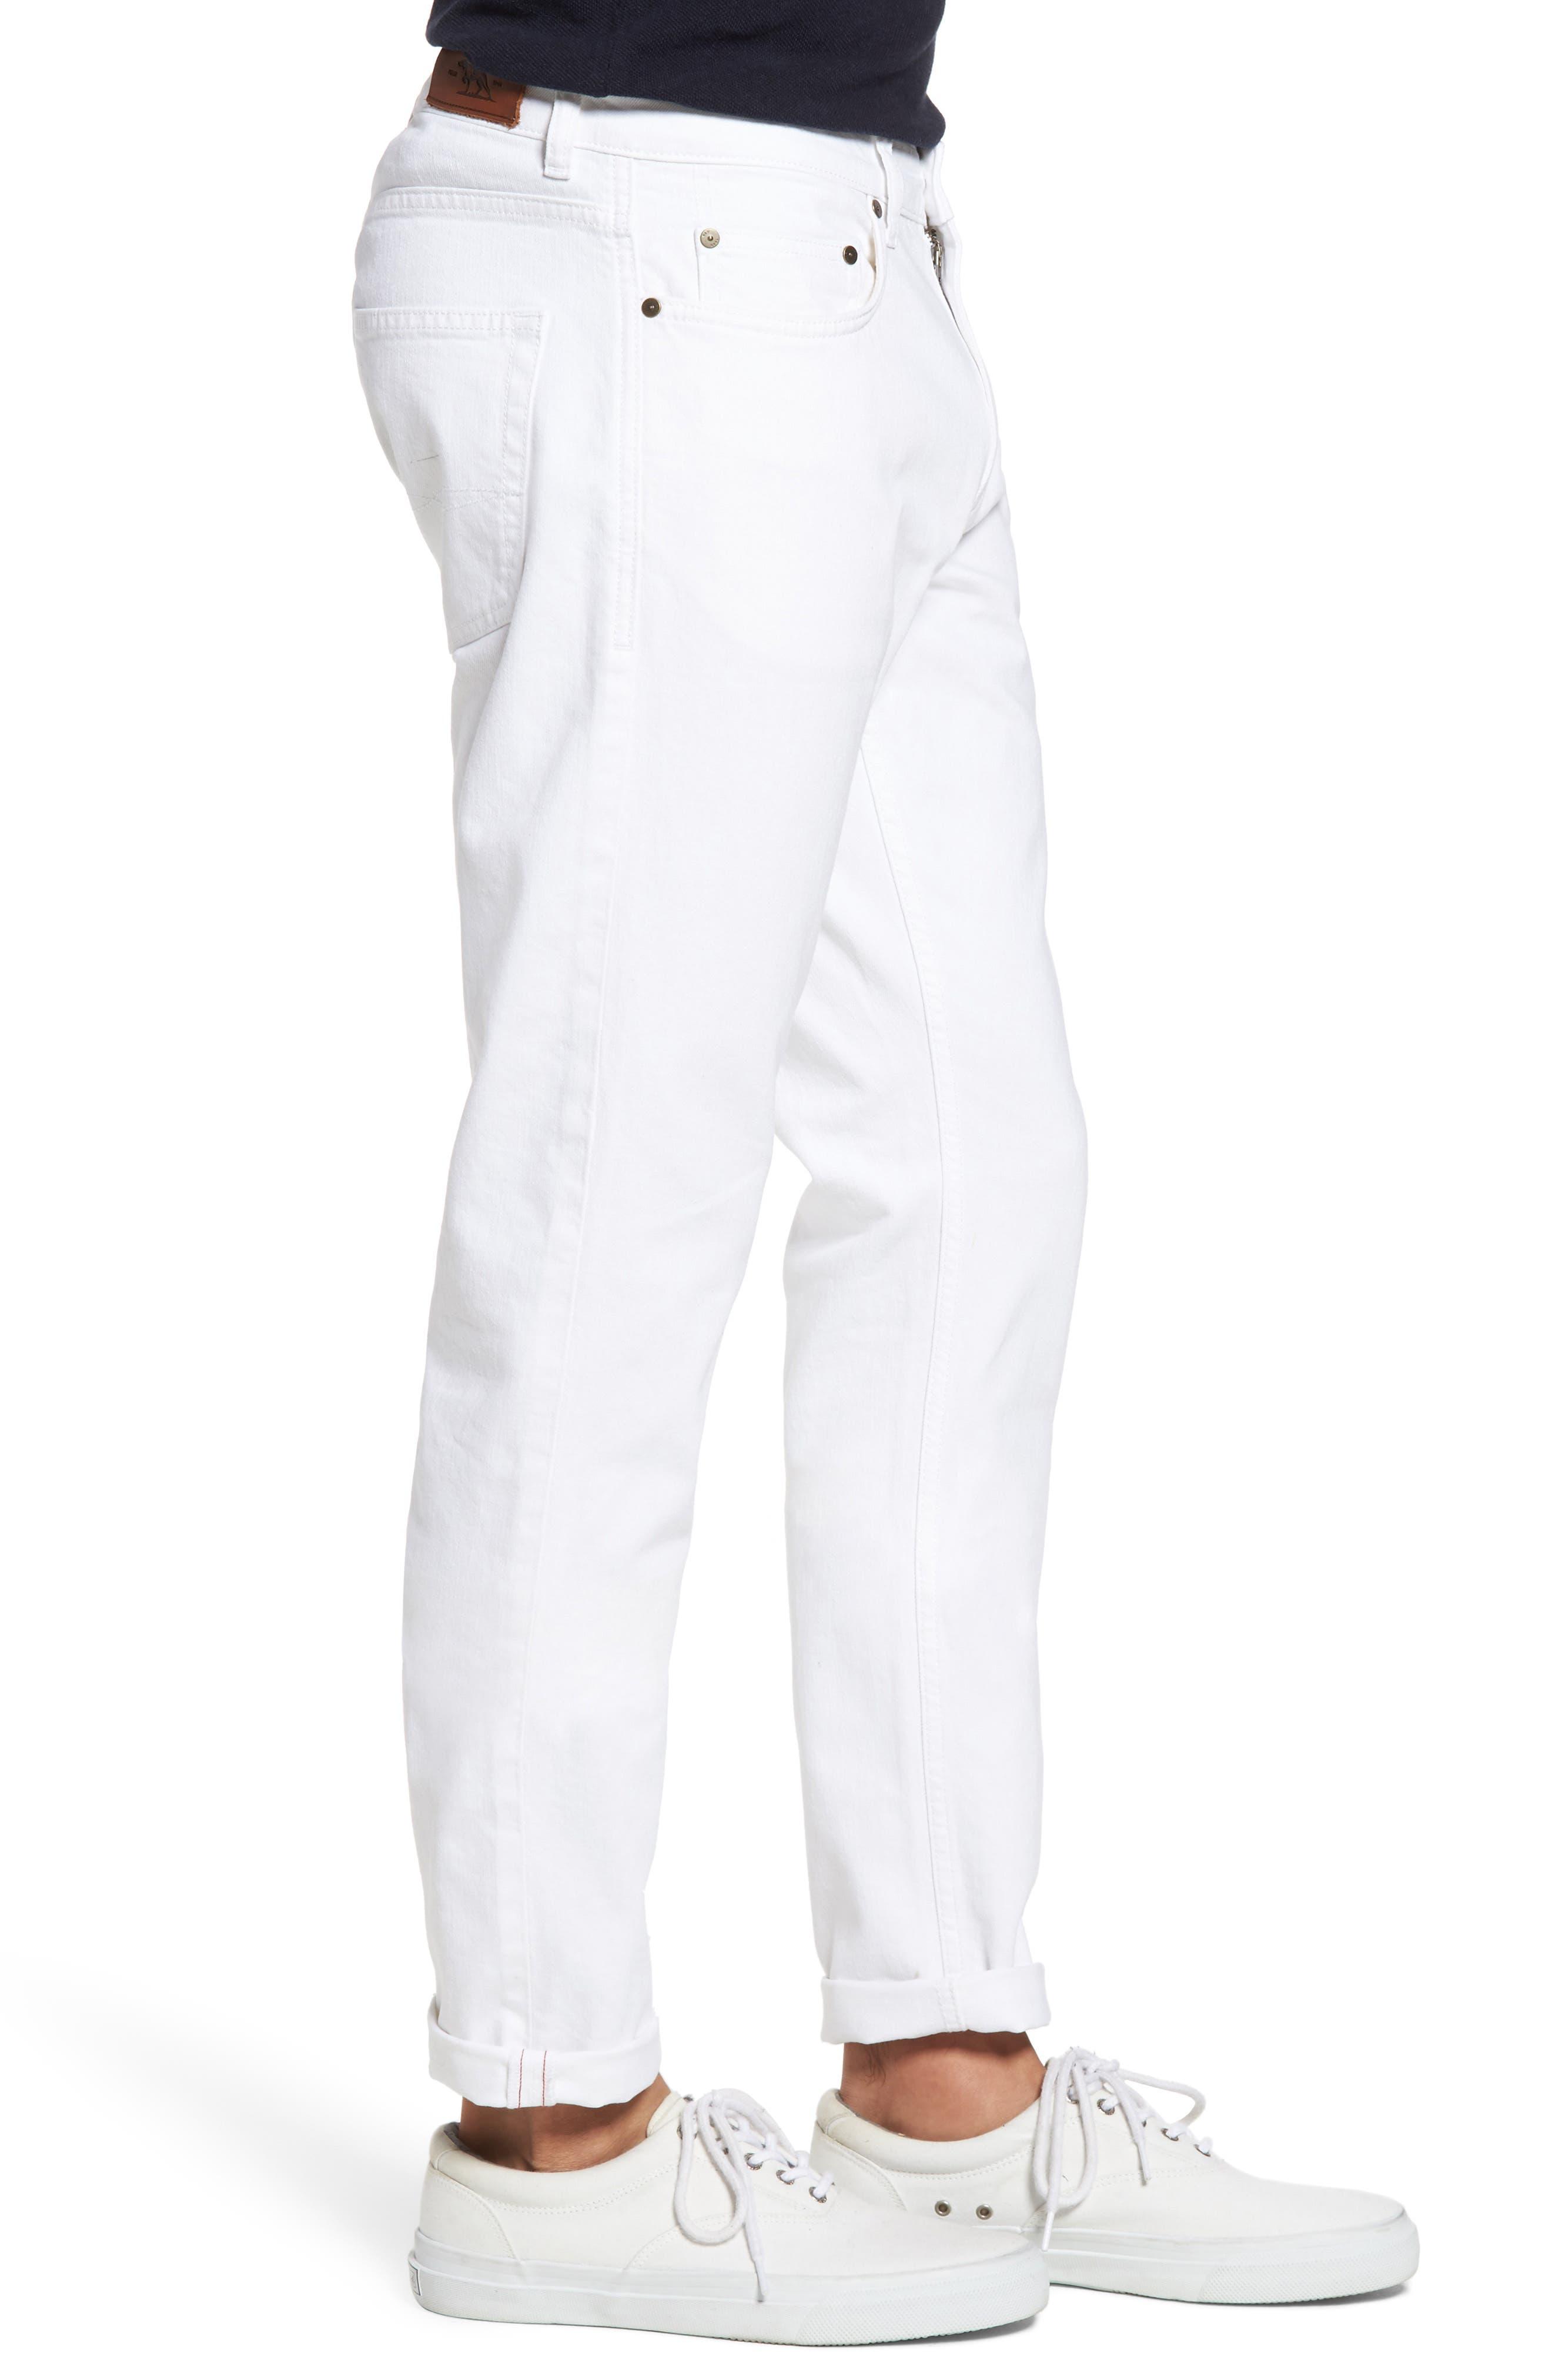 Allemand Straight Leg Jeans,                             Alternate thumbnail 3, color,                             Snow